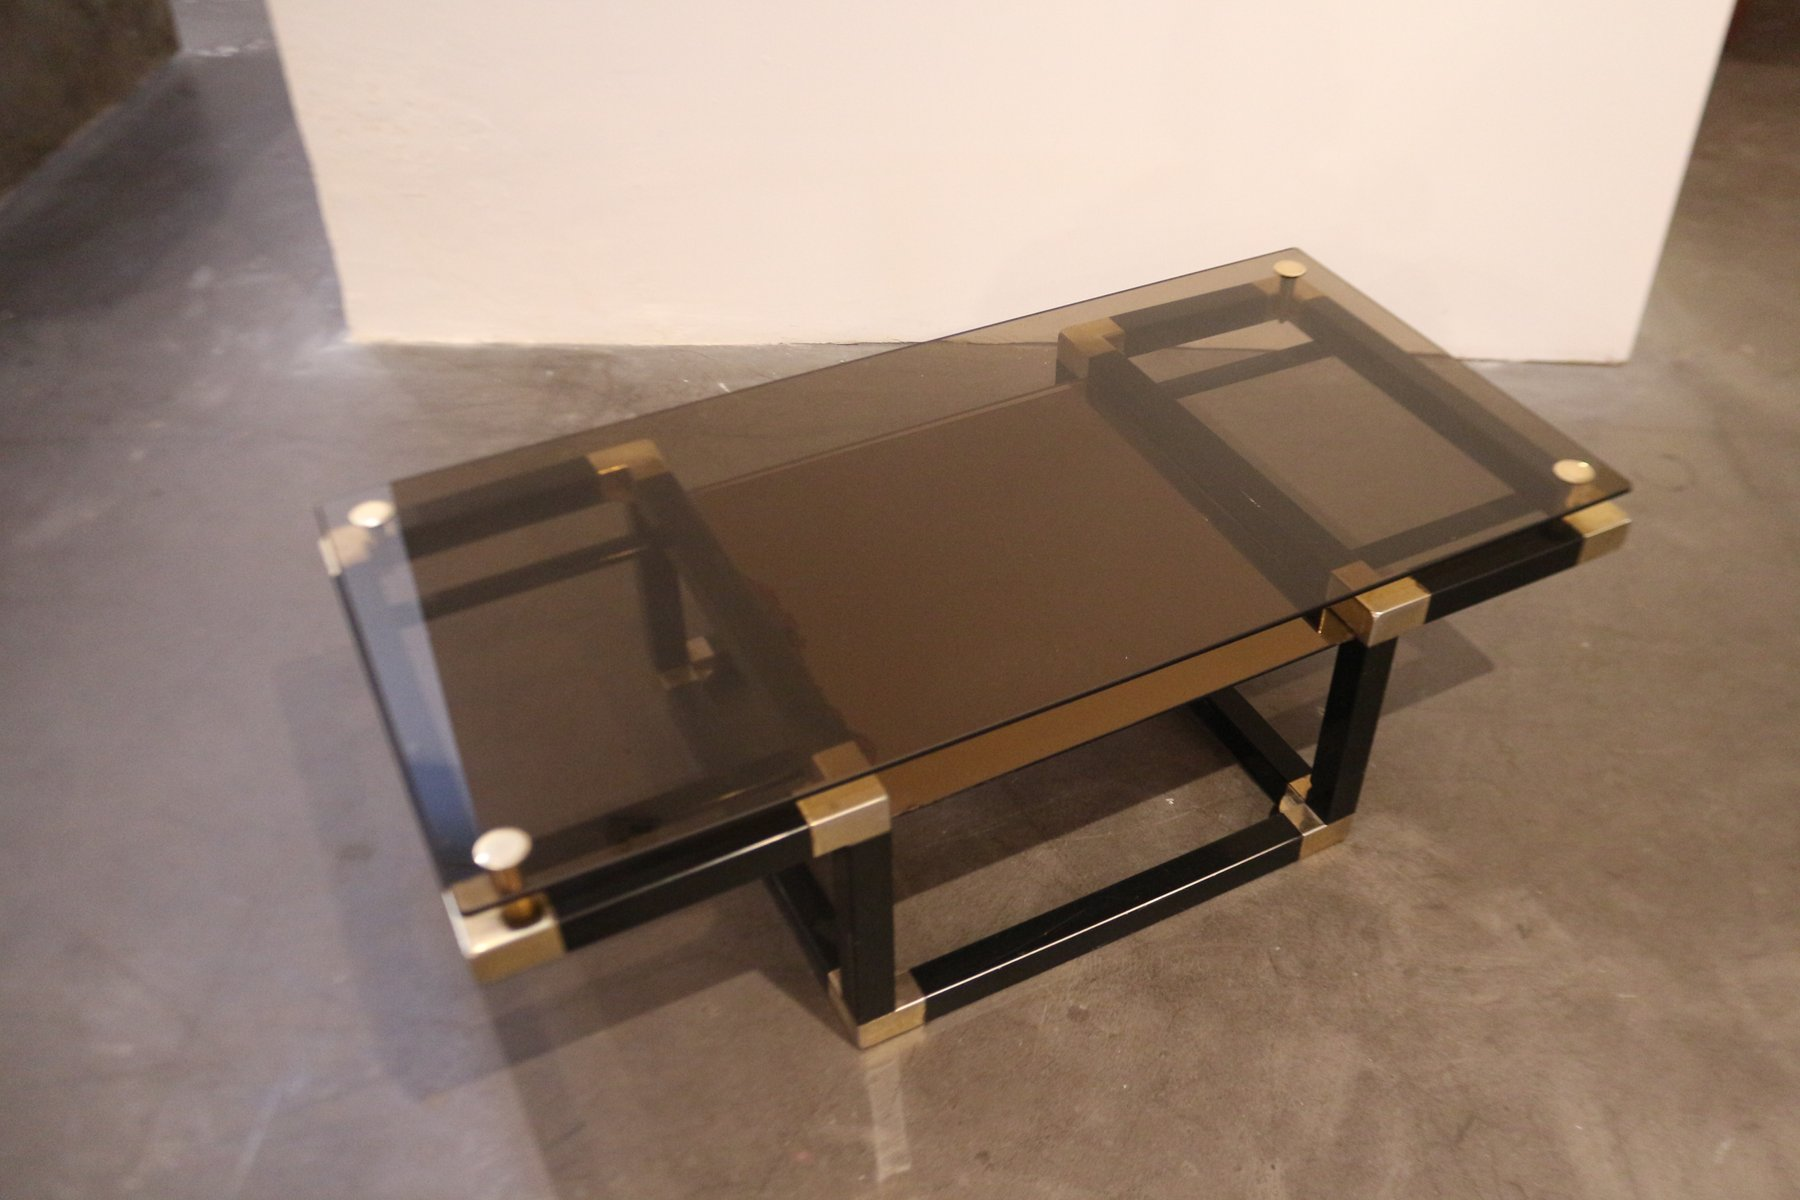 table basse en verre et m tal 1980s en vente sur pamono. Black Bedroom Furniture Sets. Home Design Ideas